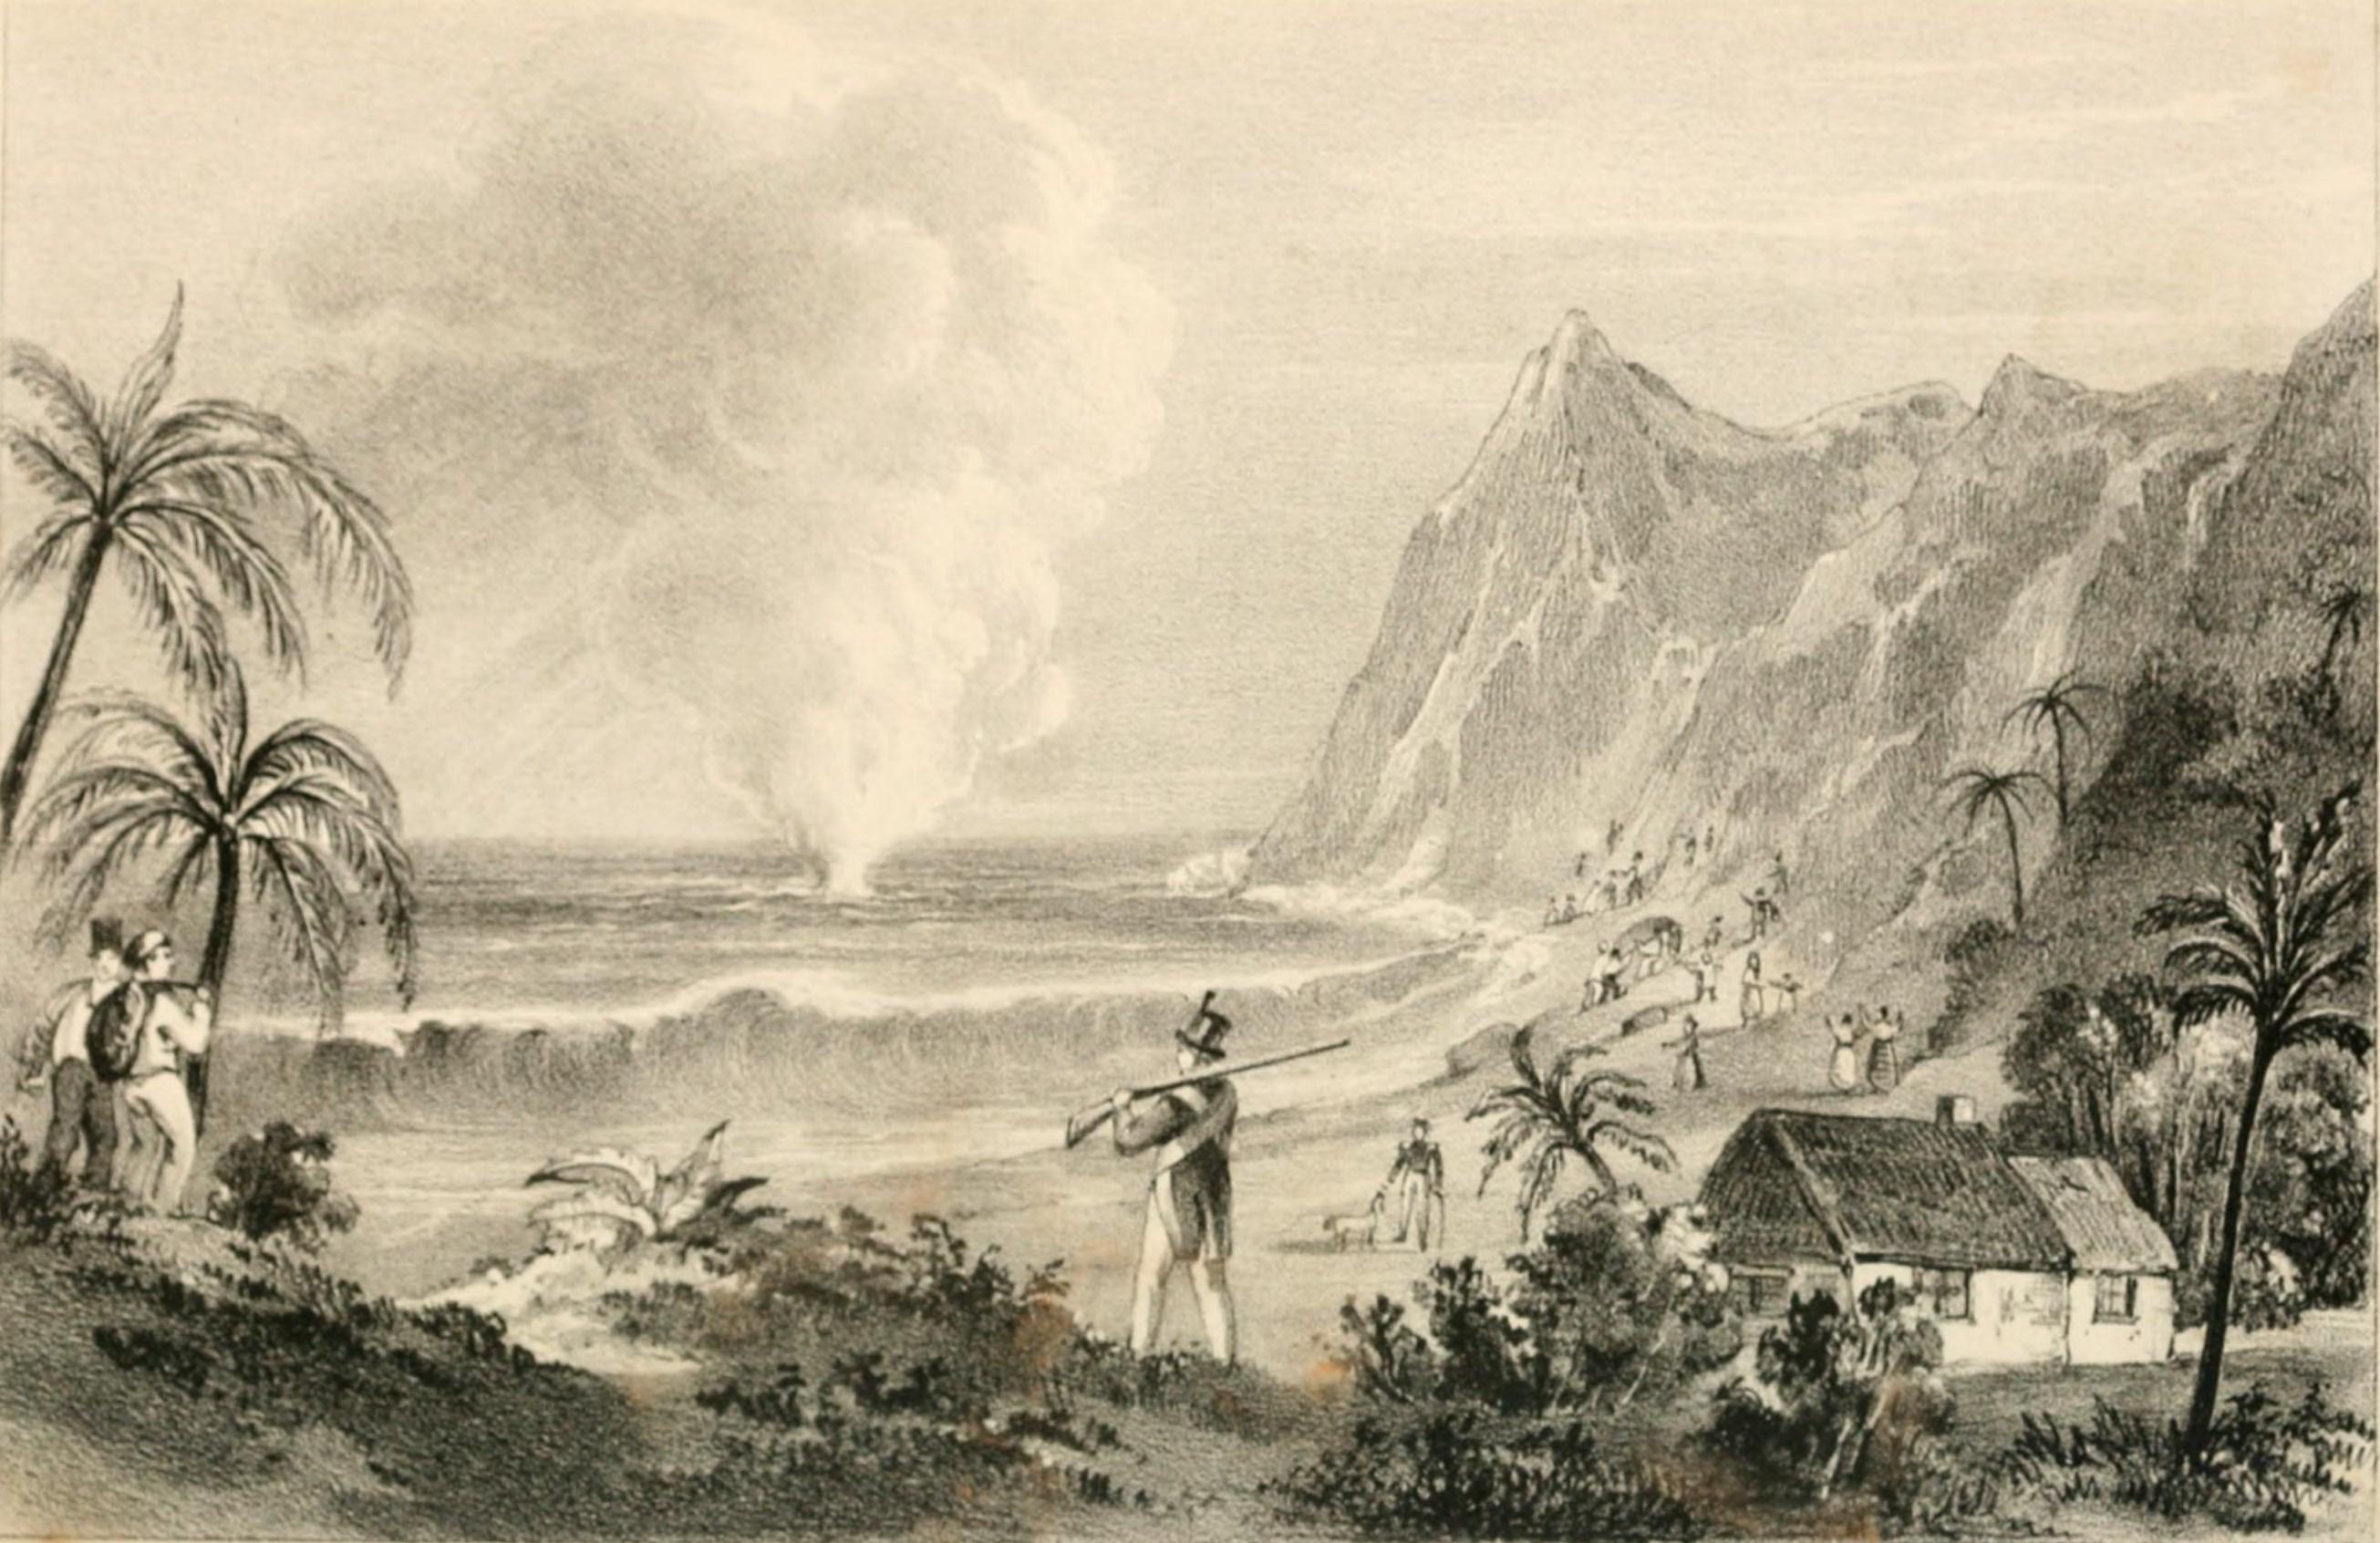 File:Erupción submarina en isla Juan Fernandez (1835).jpg